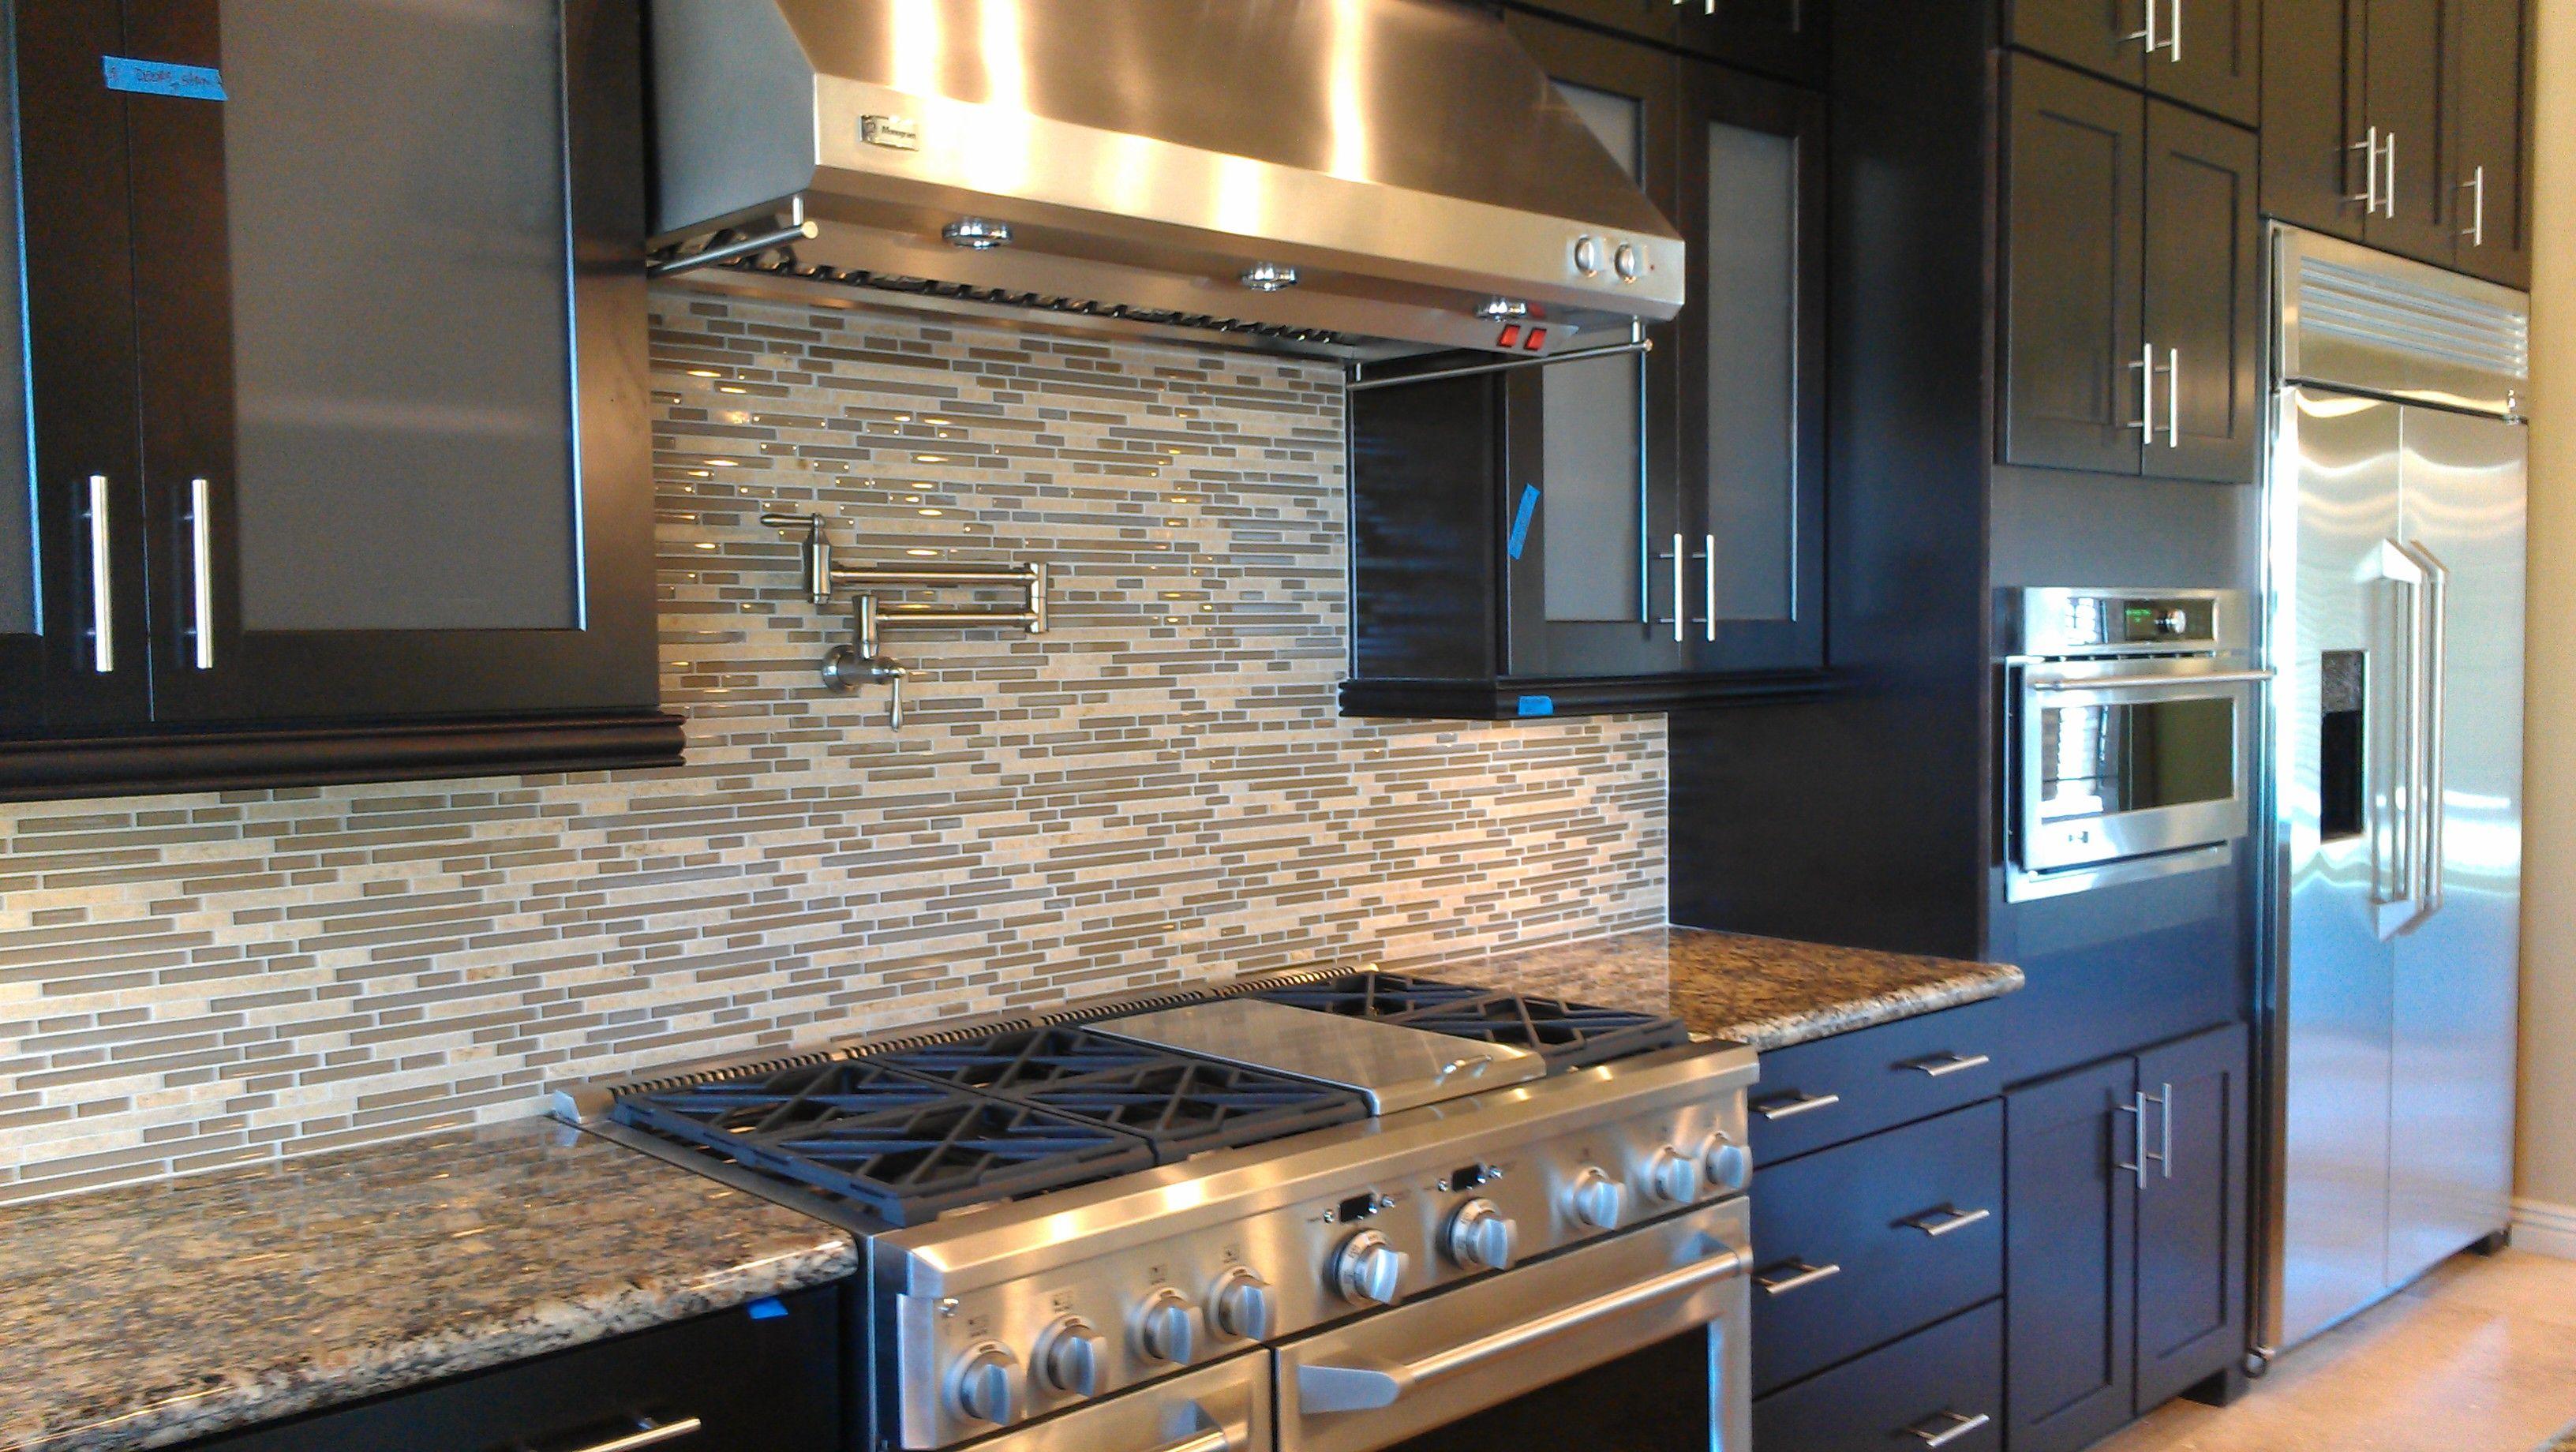 Commercial Grade Appliances Kitchens I Love Pinterest